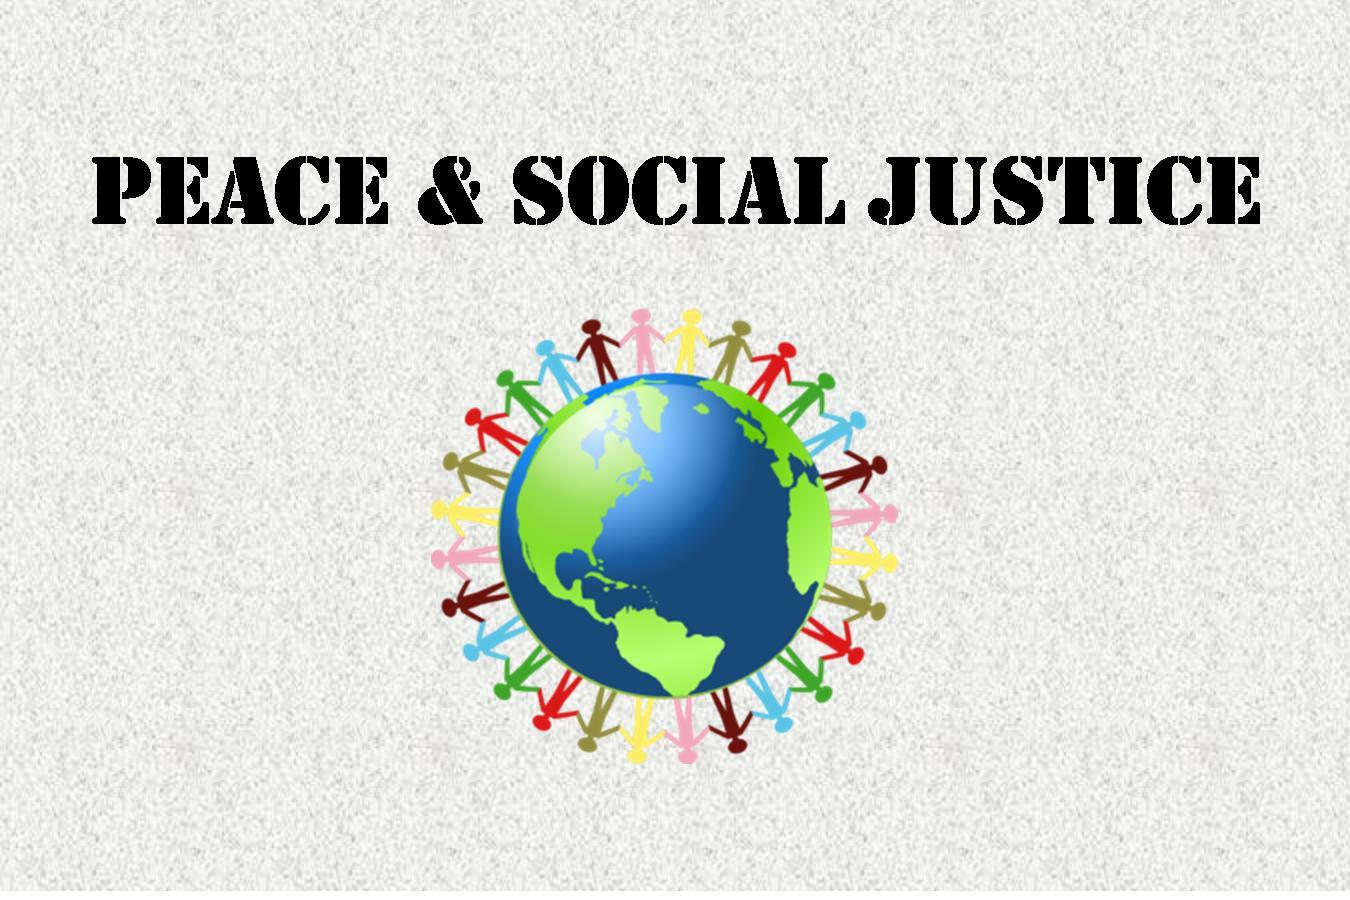 Peace & Social Justice